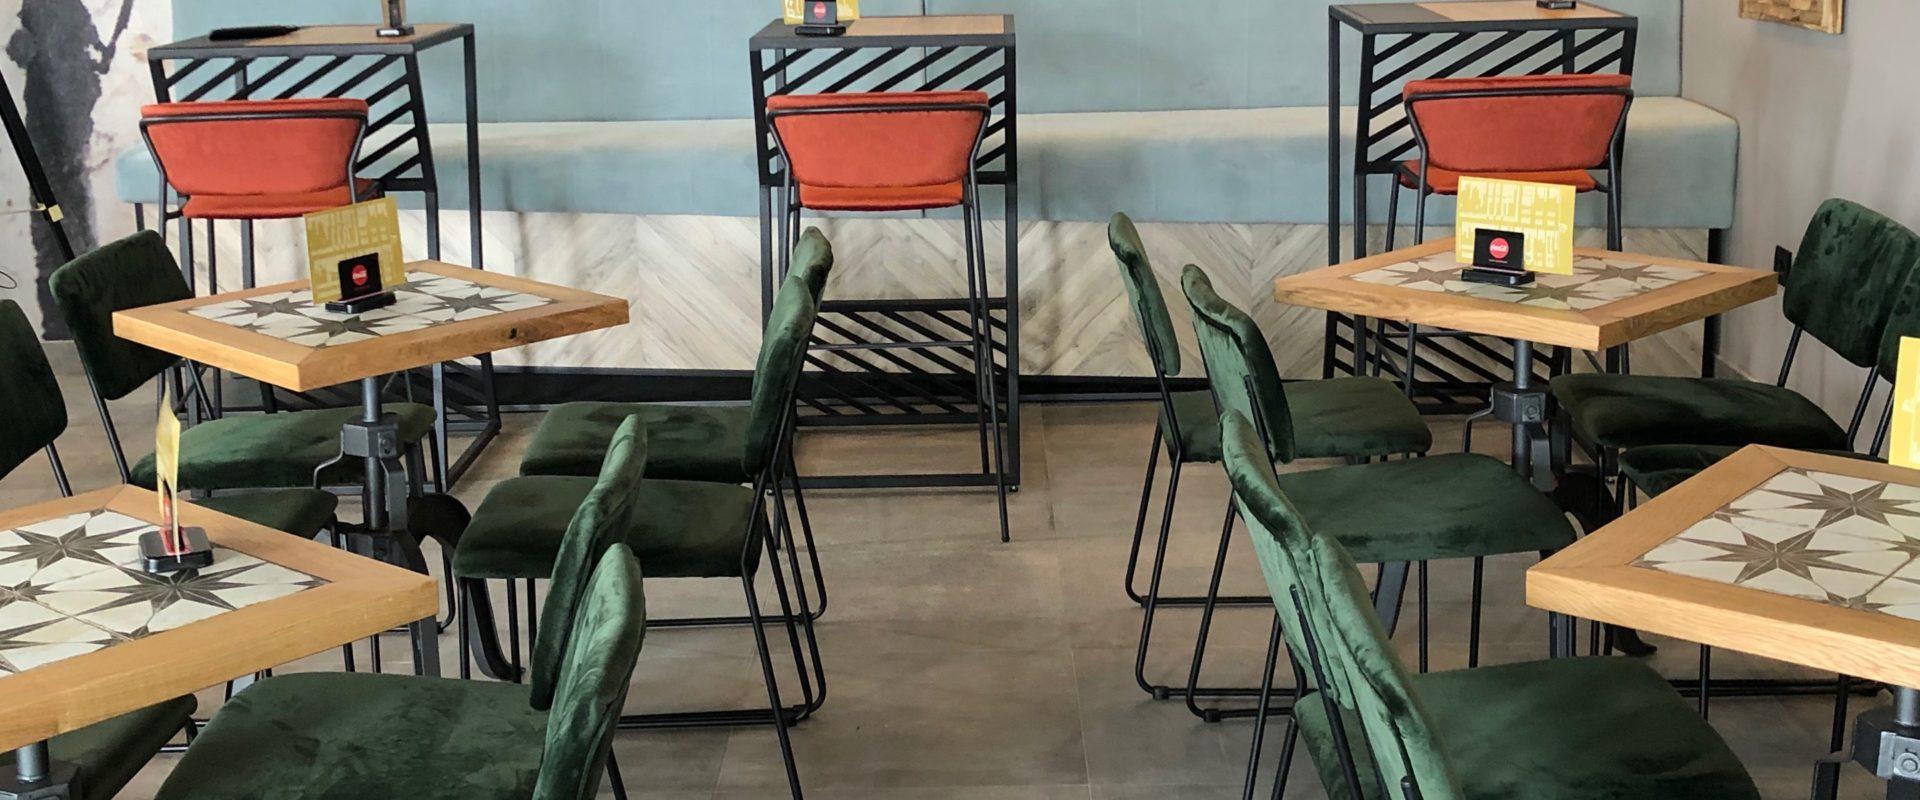 Zivot Design-Bamboo Caffe Bar